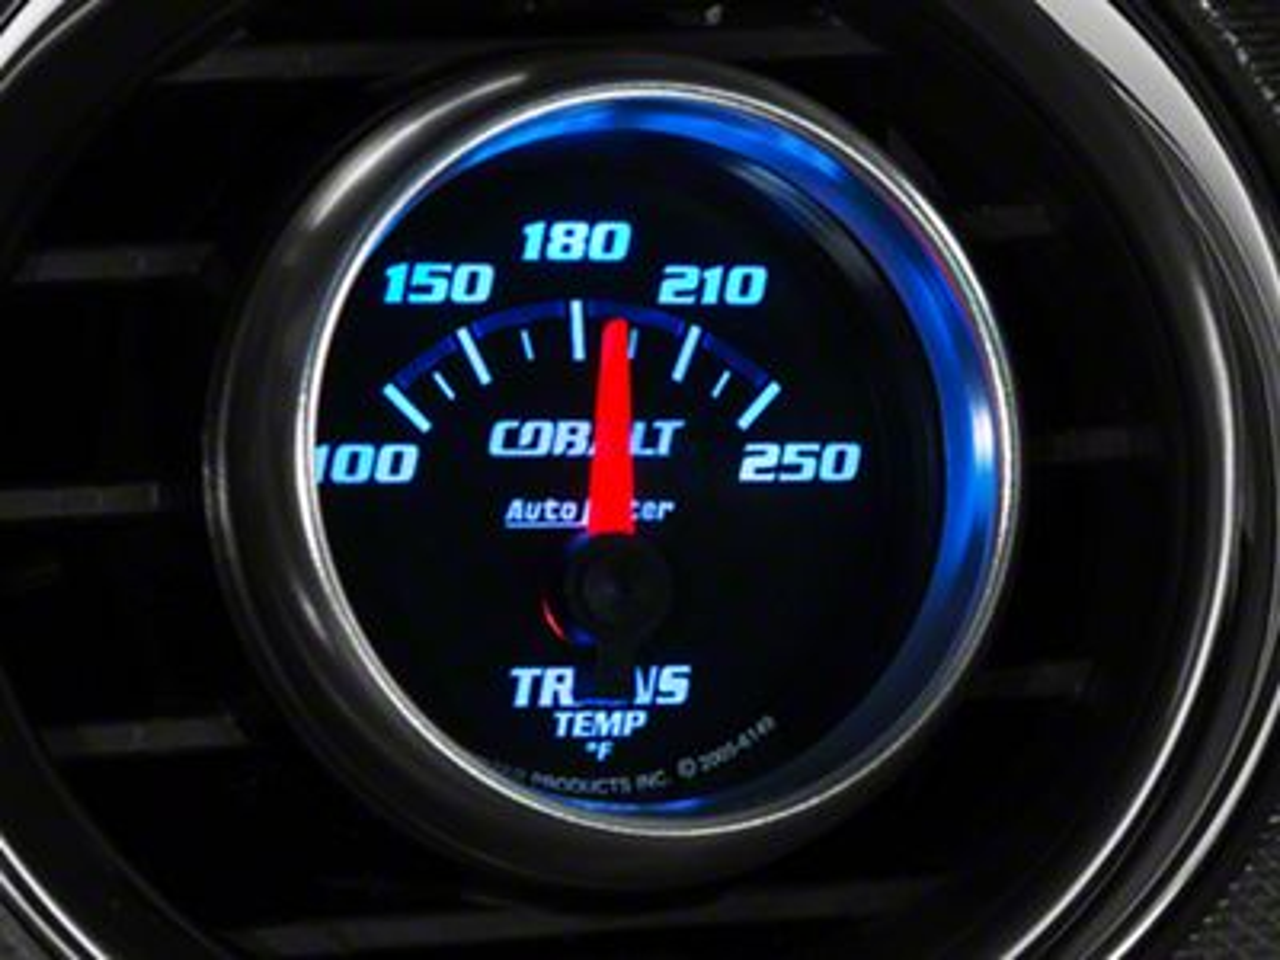 Auto Meter Cobalt Transmission Temp Gauge - Electrical (08-18 All)